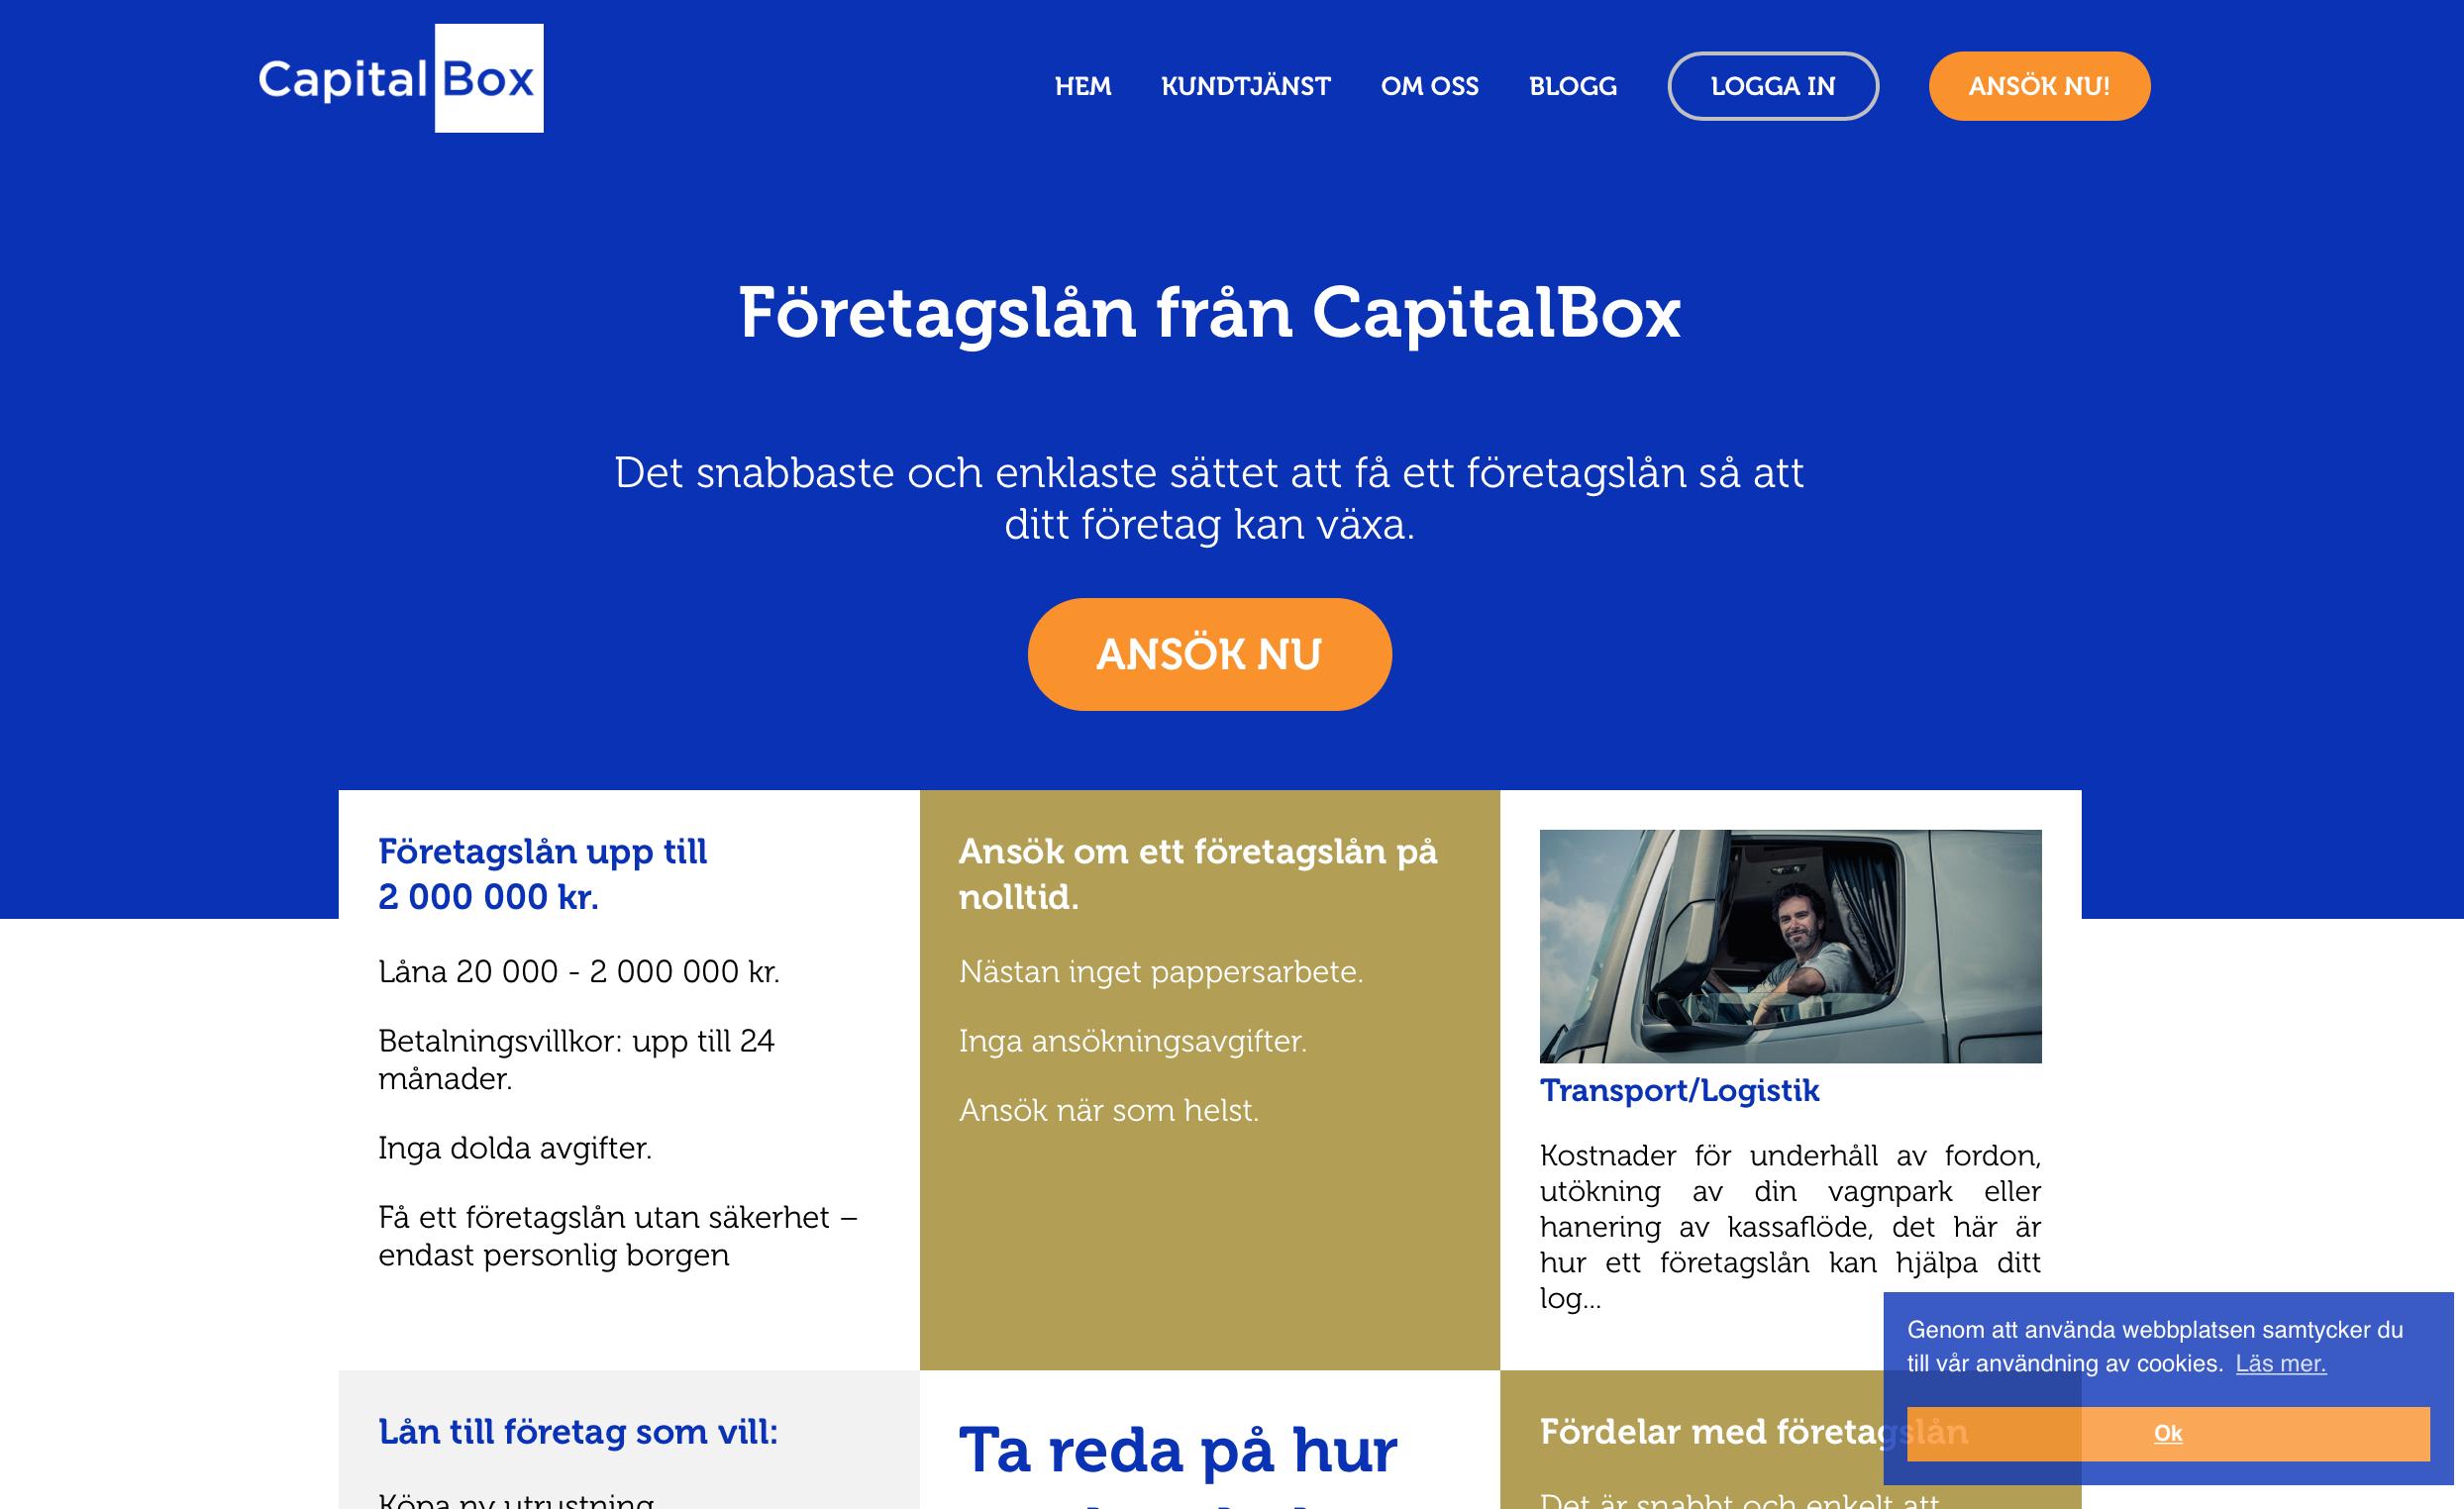 capital box stor bild